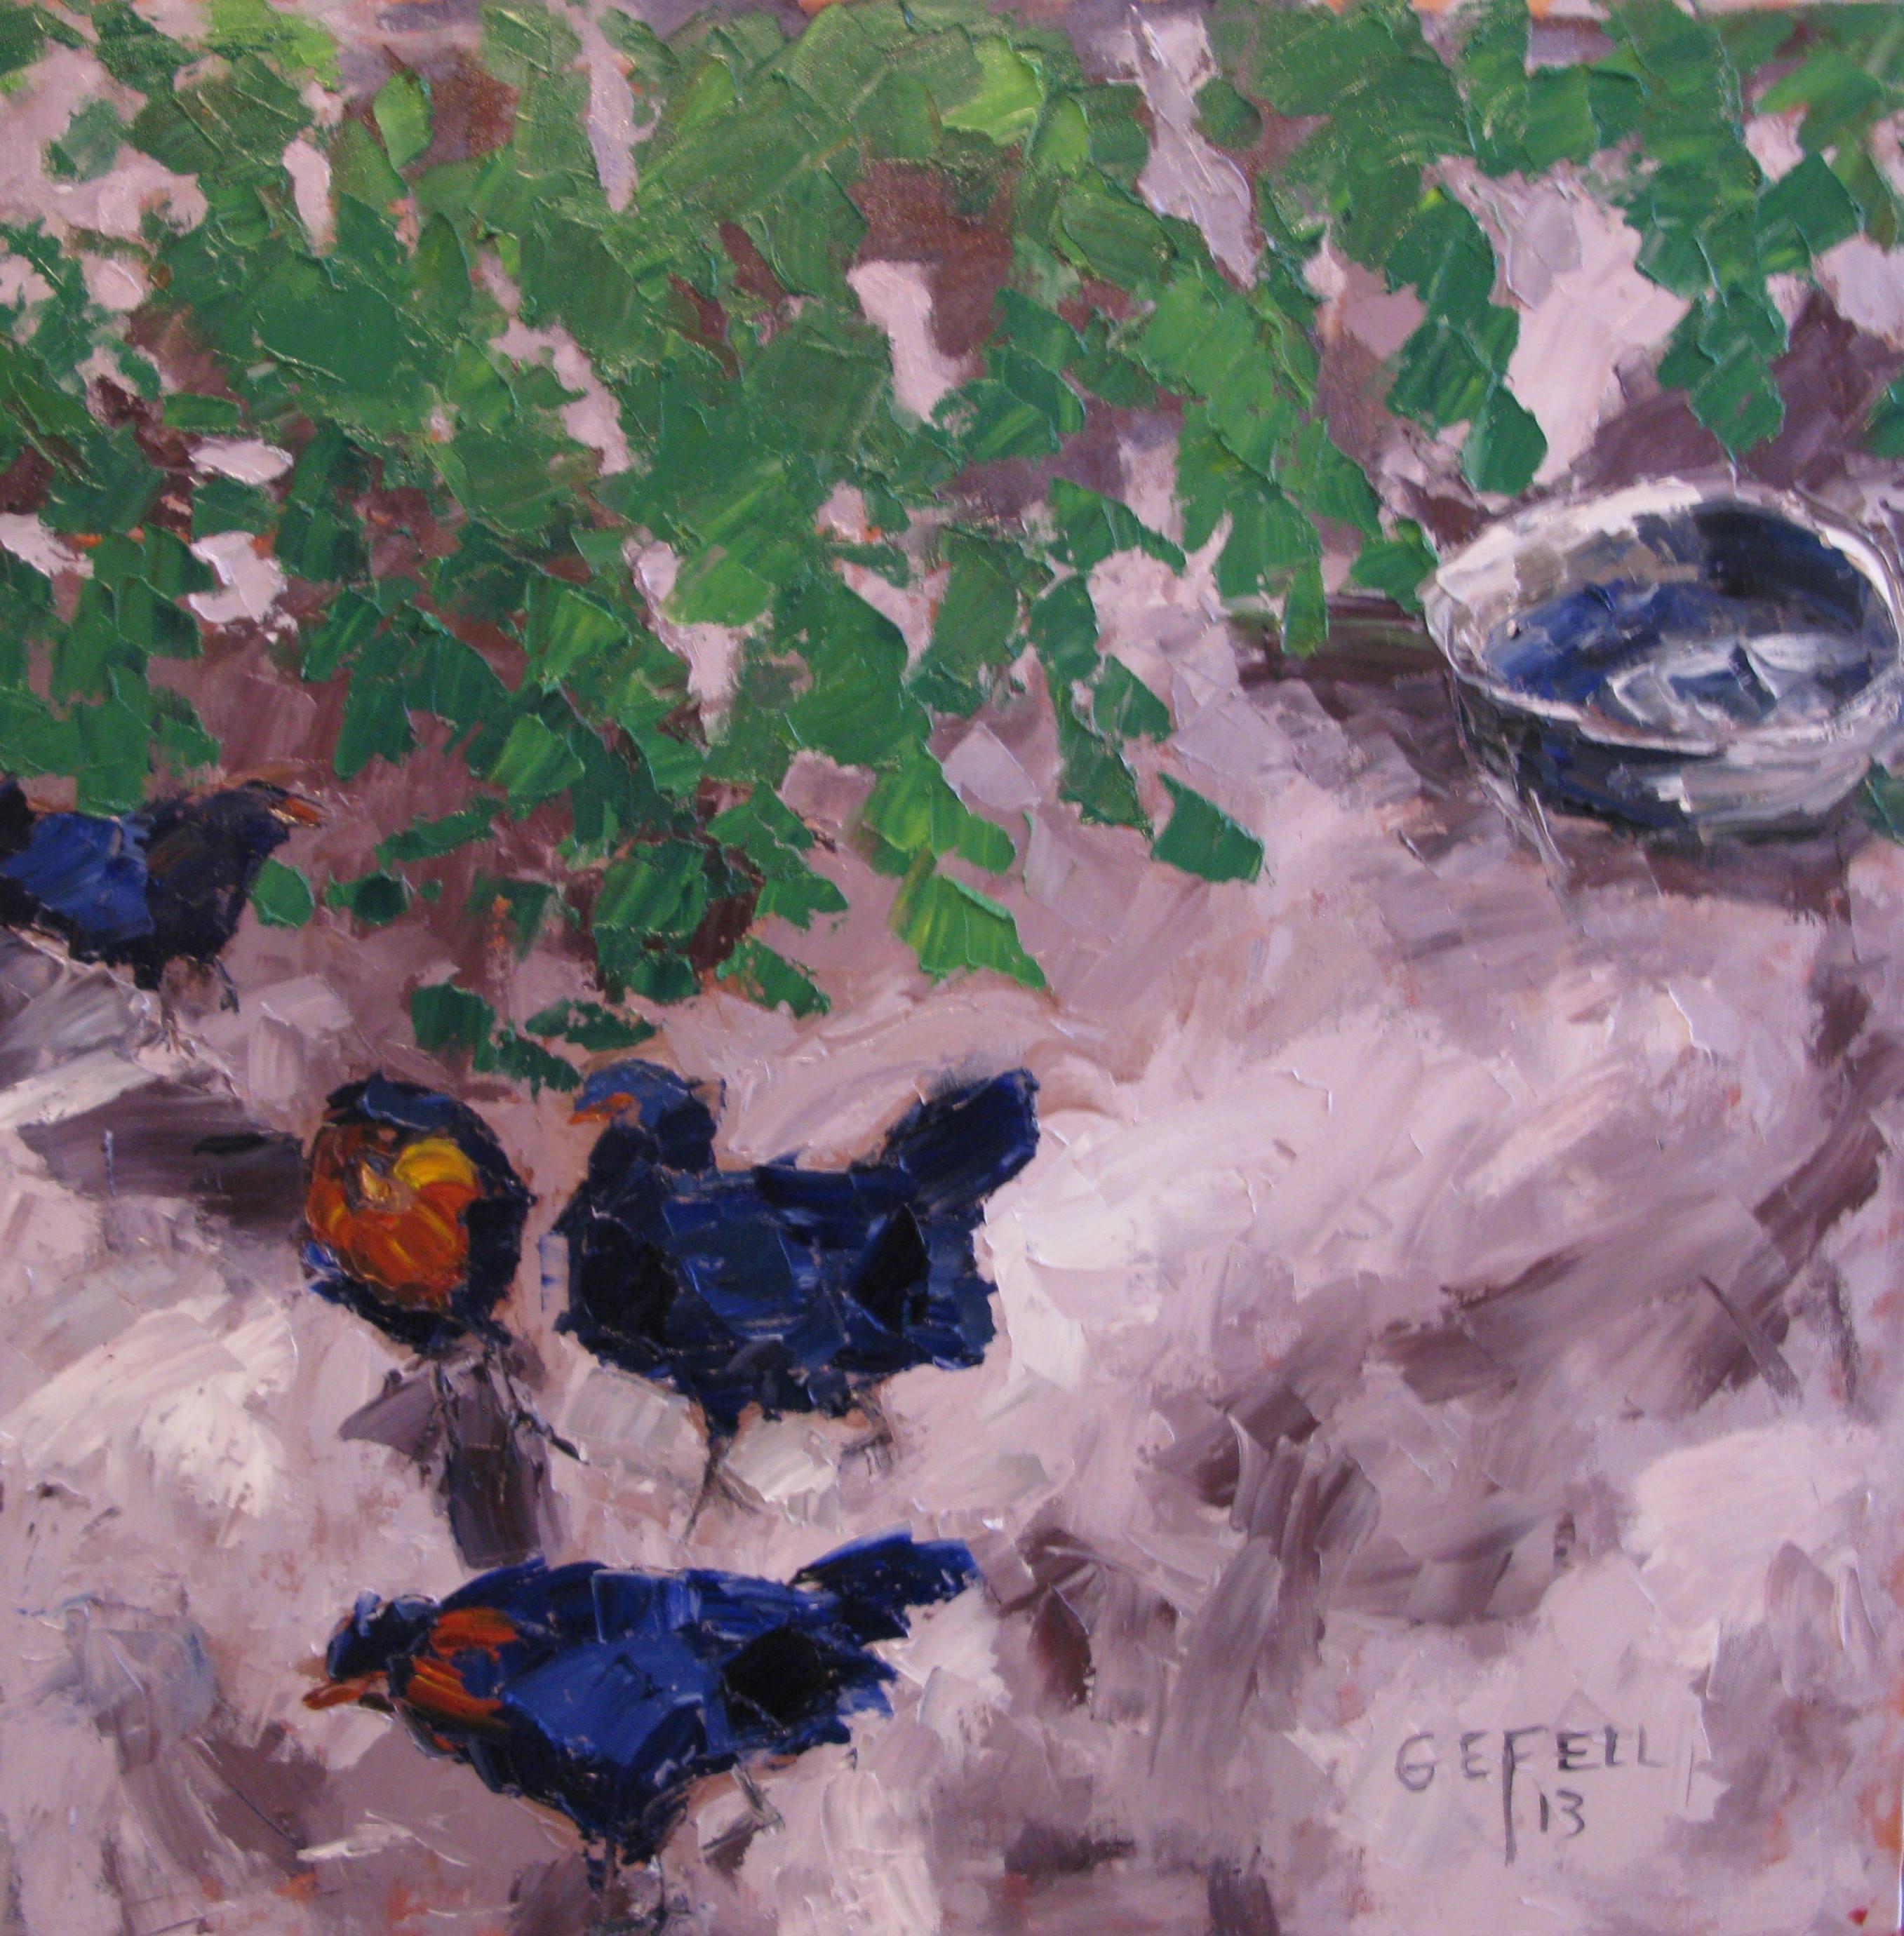 Chickens (oil on canvas) by artist Kathleen Gefell, New York